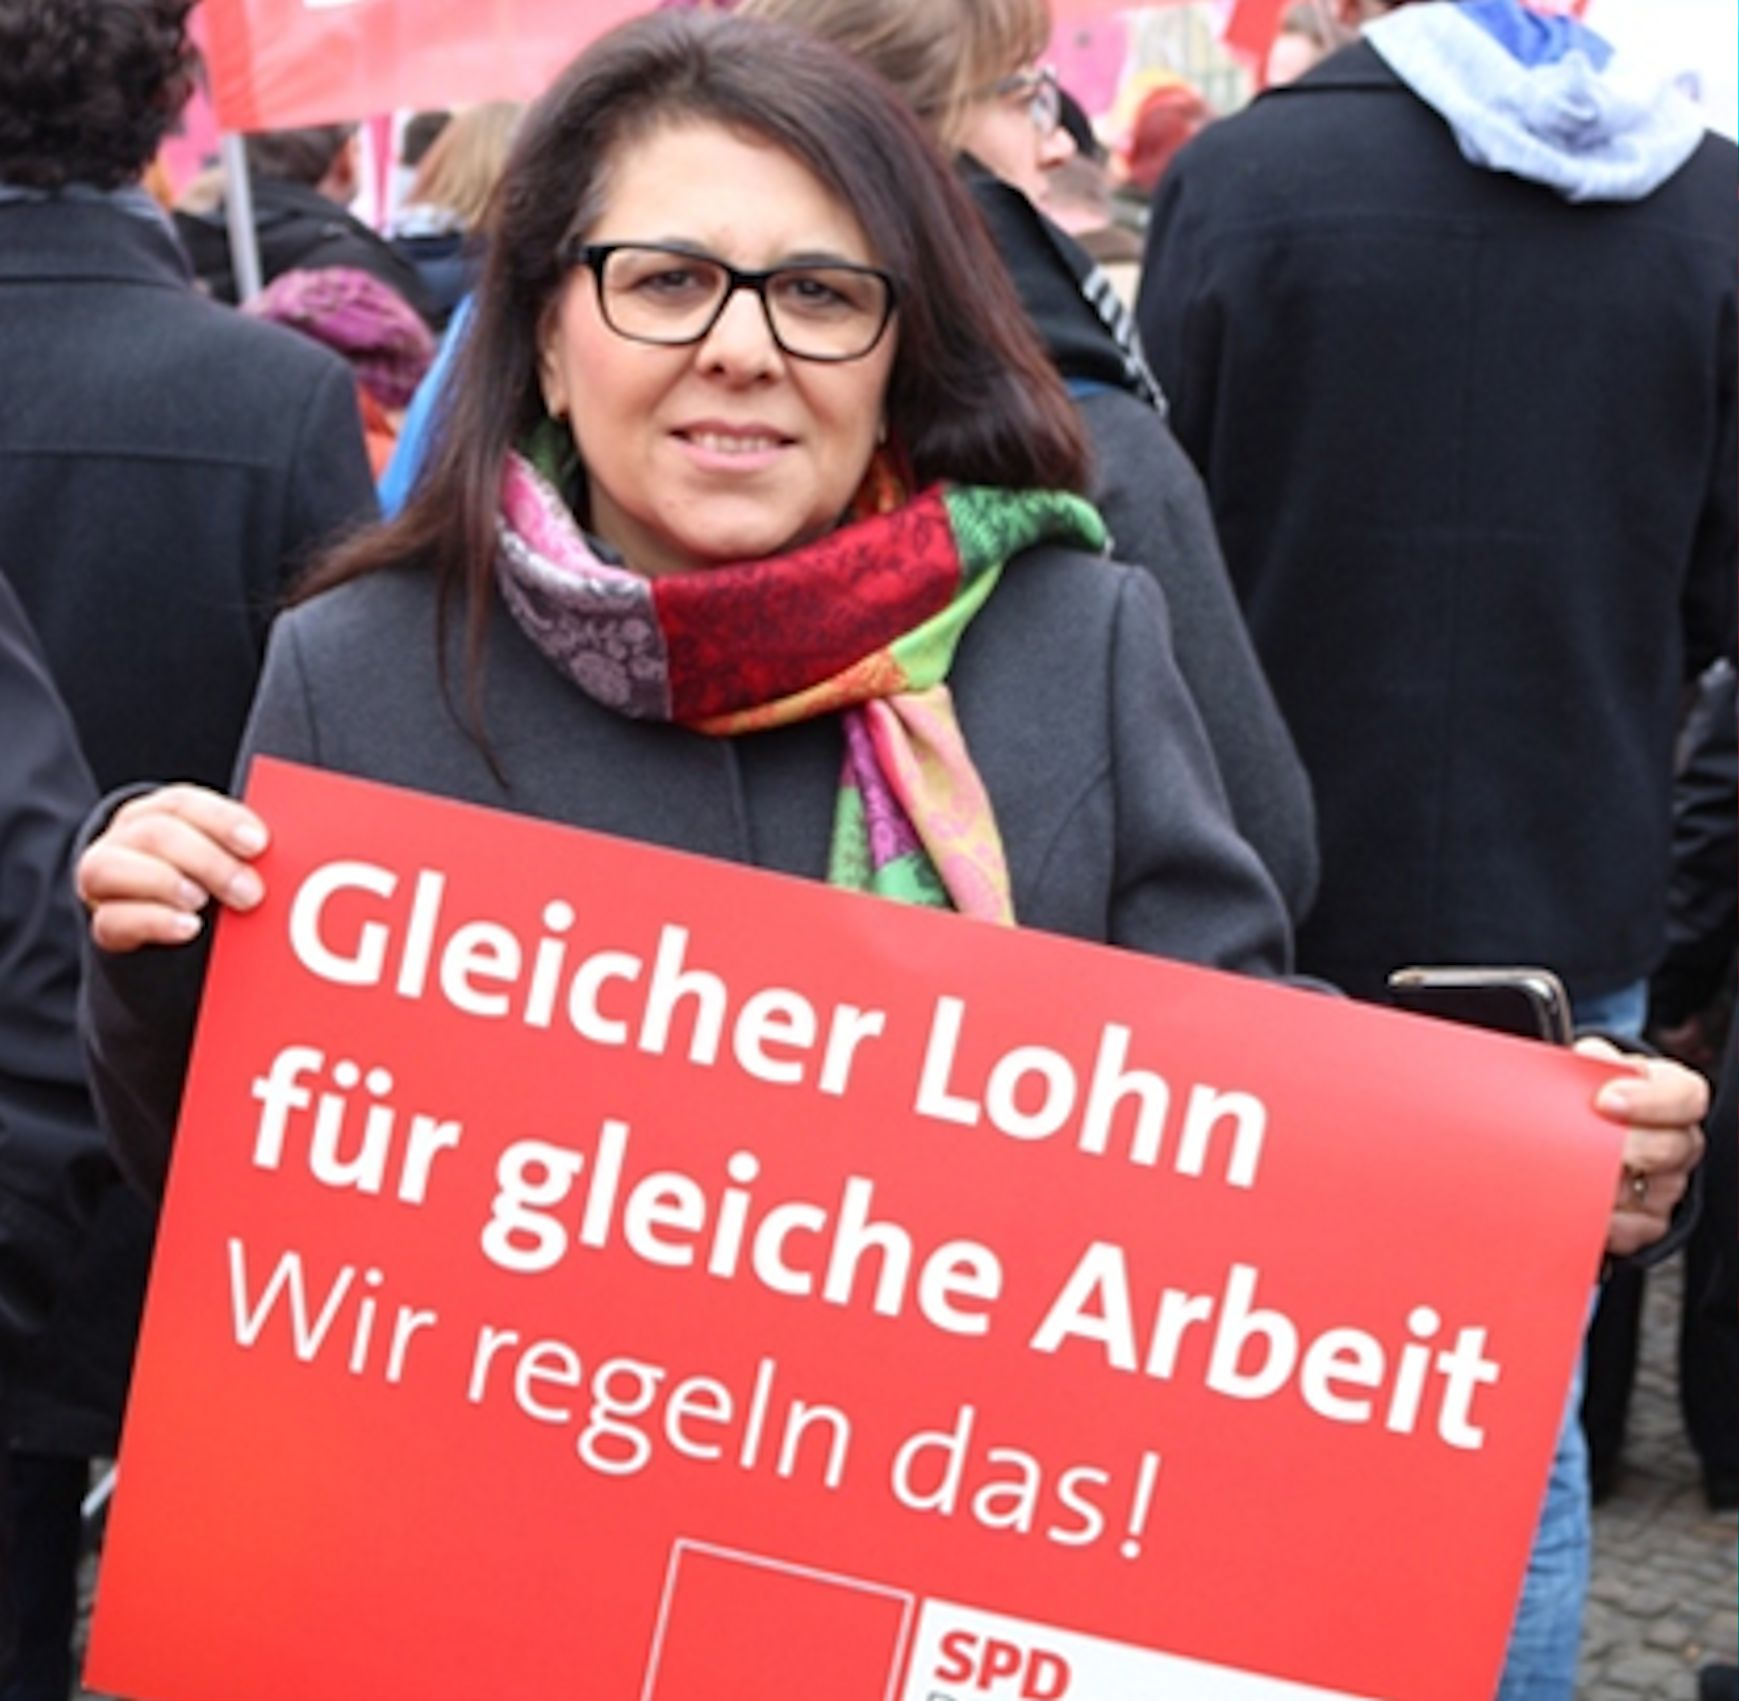 SPD-Bundestagsabgeordnete Gülistan Yüksel